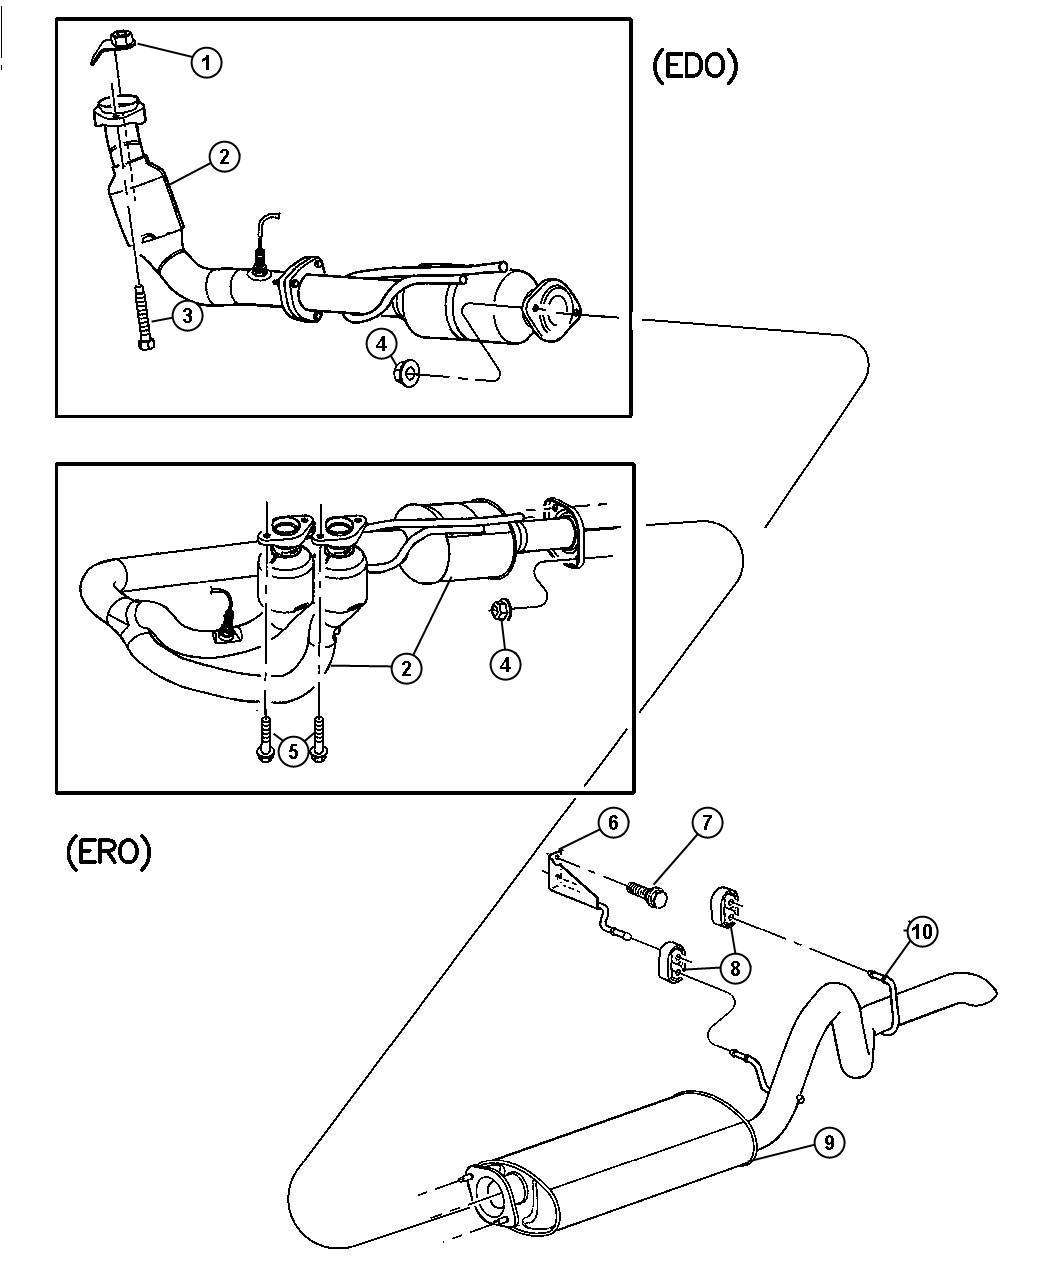 Jeep Wrangler Nut. Hex flange head locking. M14x2